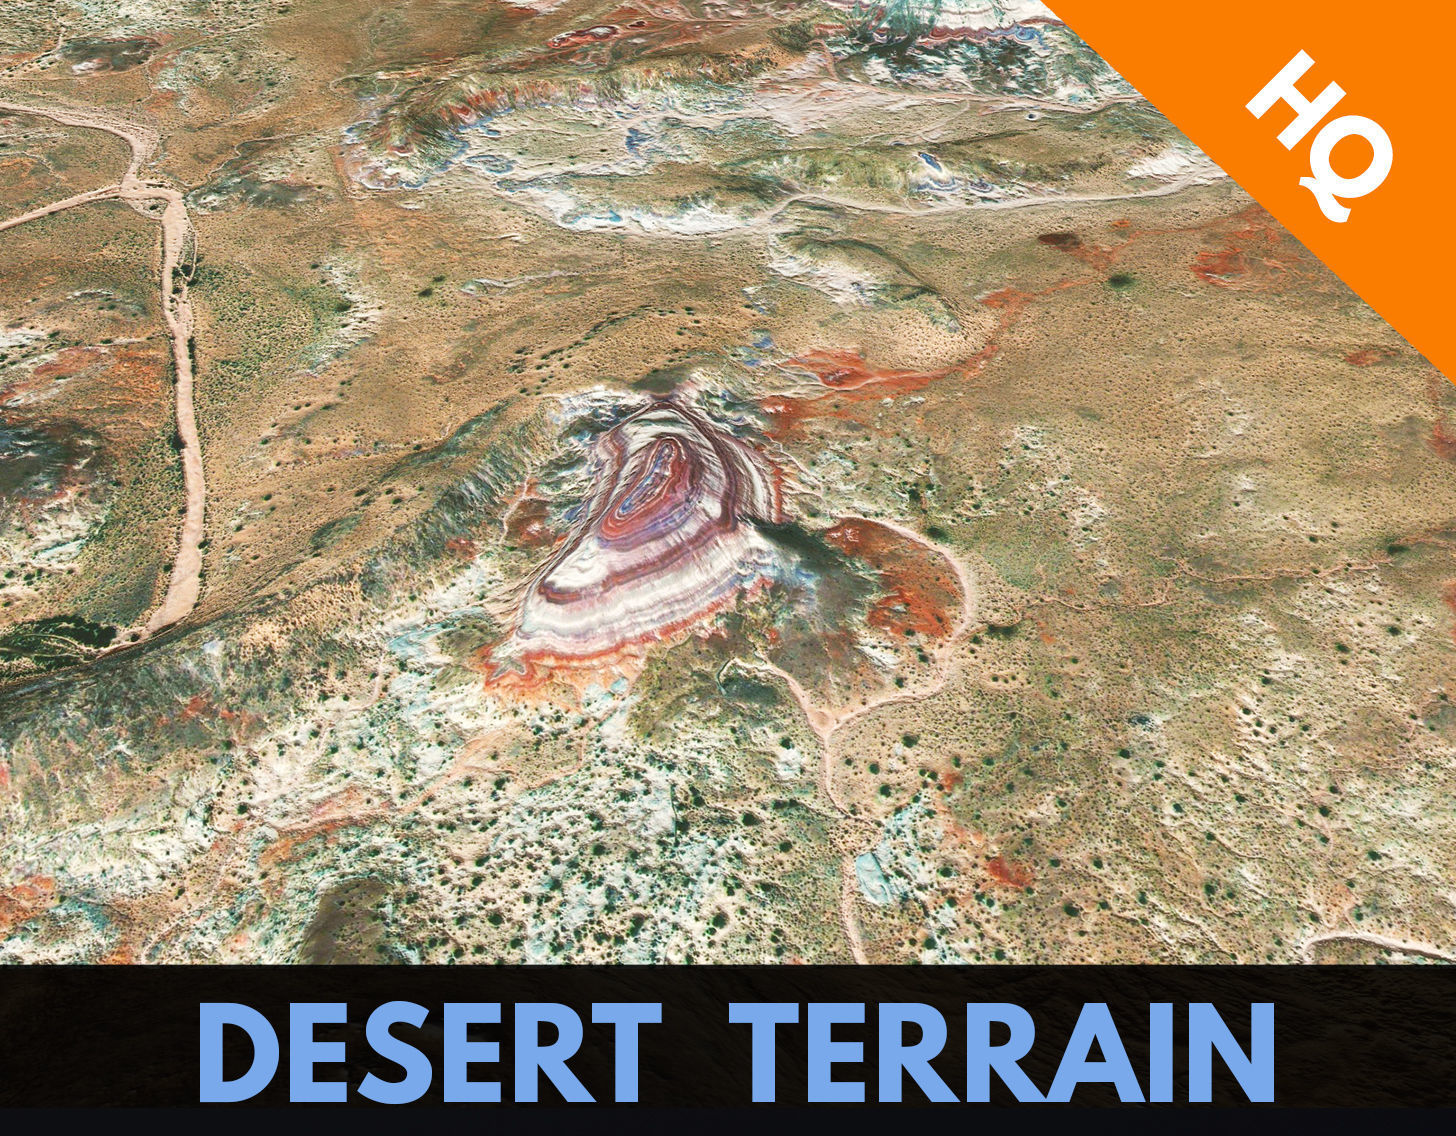 Desert Terrain Alien Planet Surface  Relief Landscape PBR 12